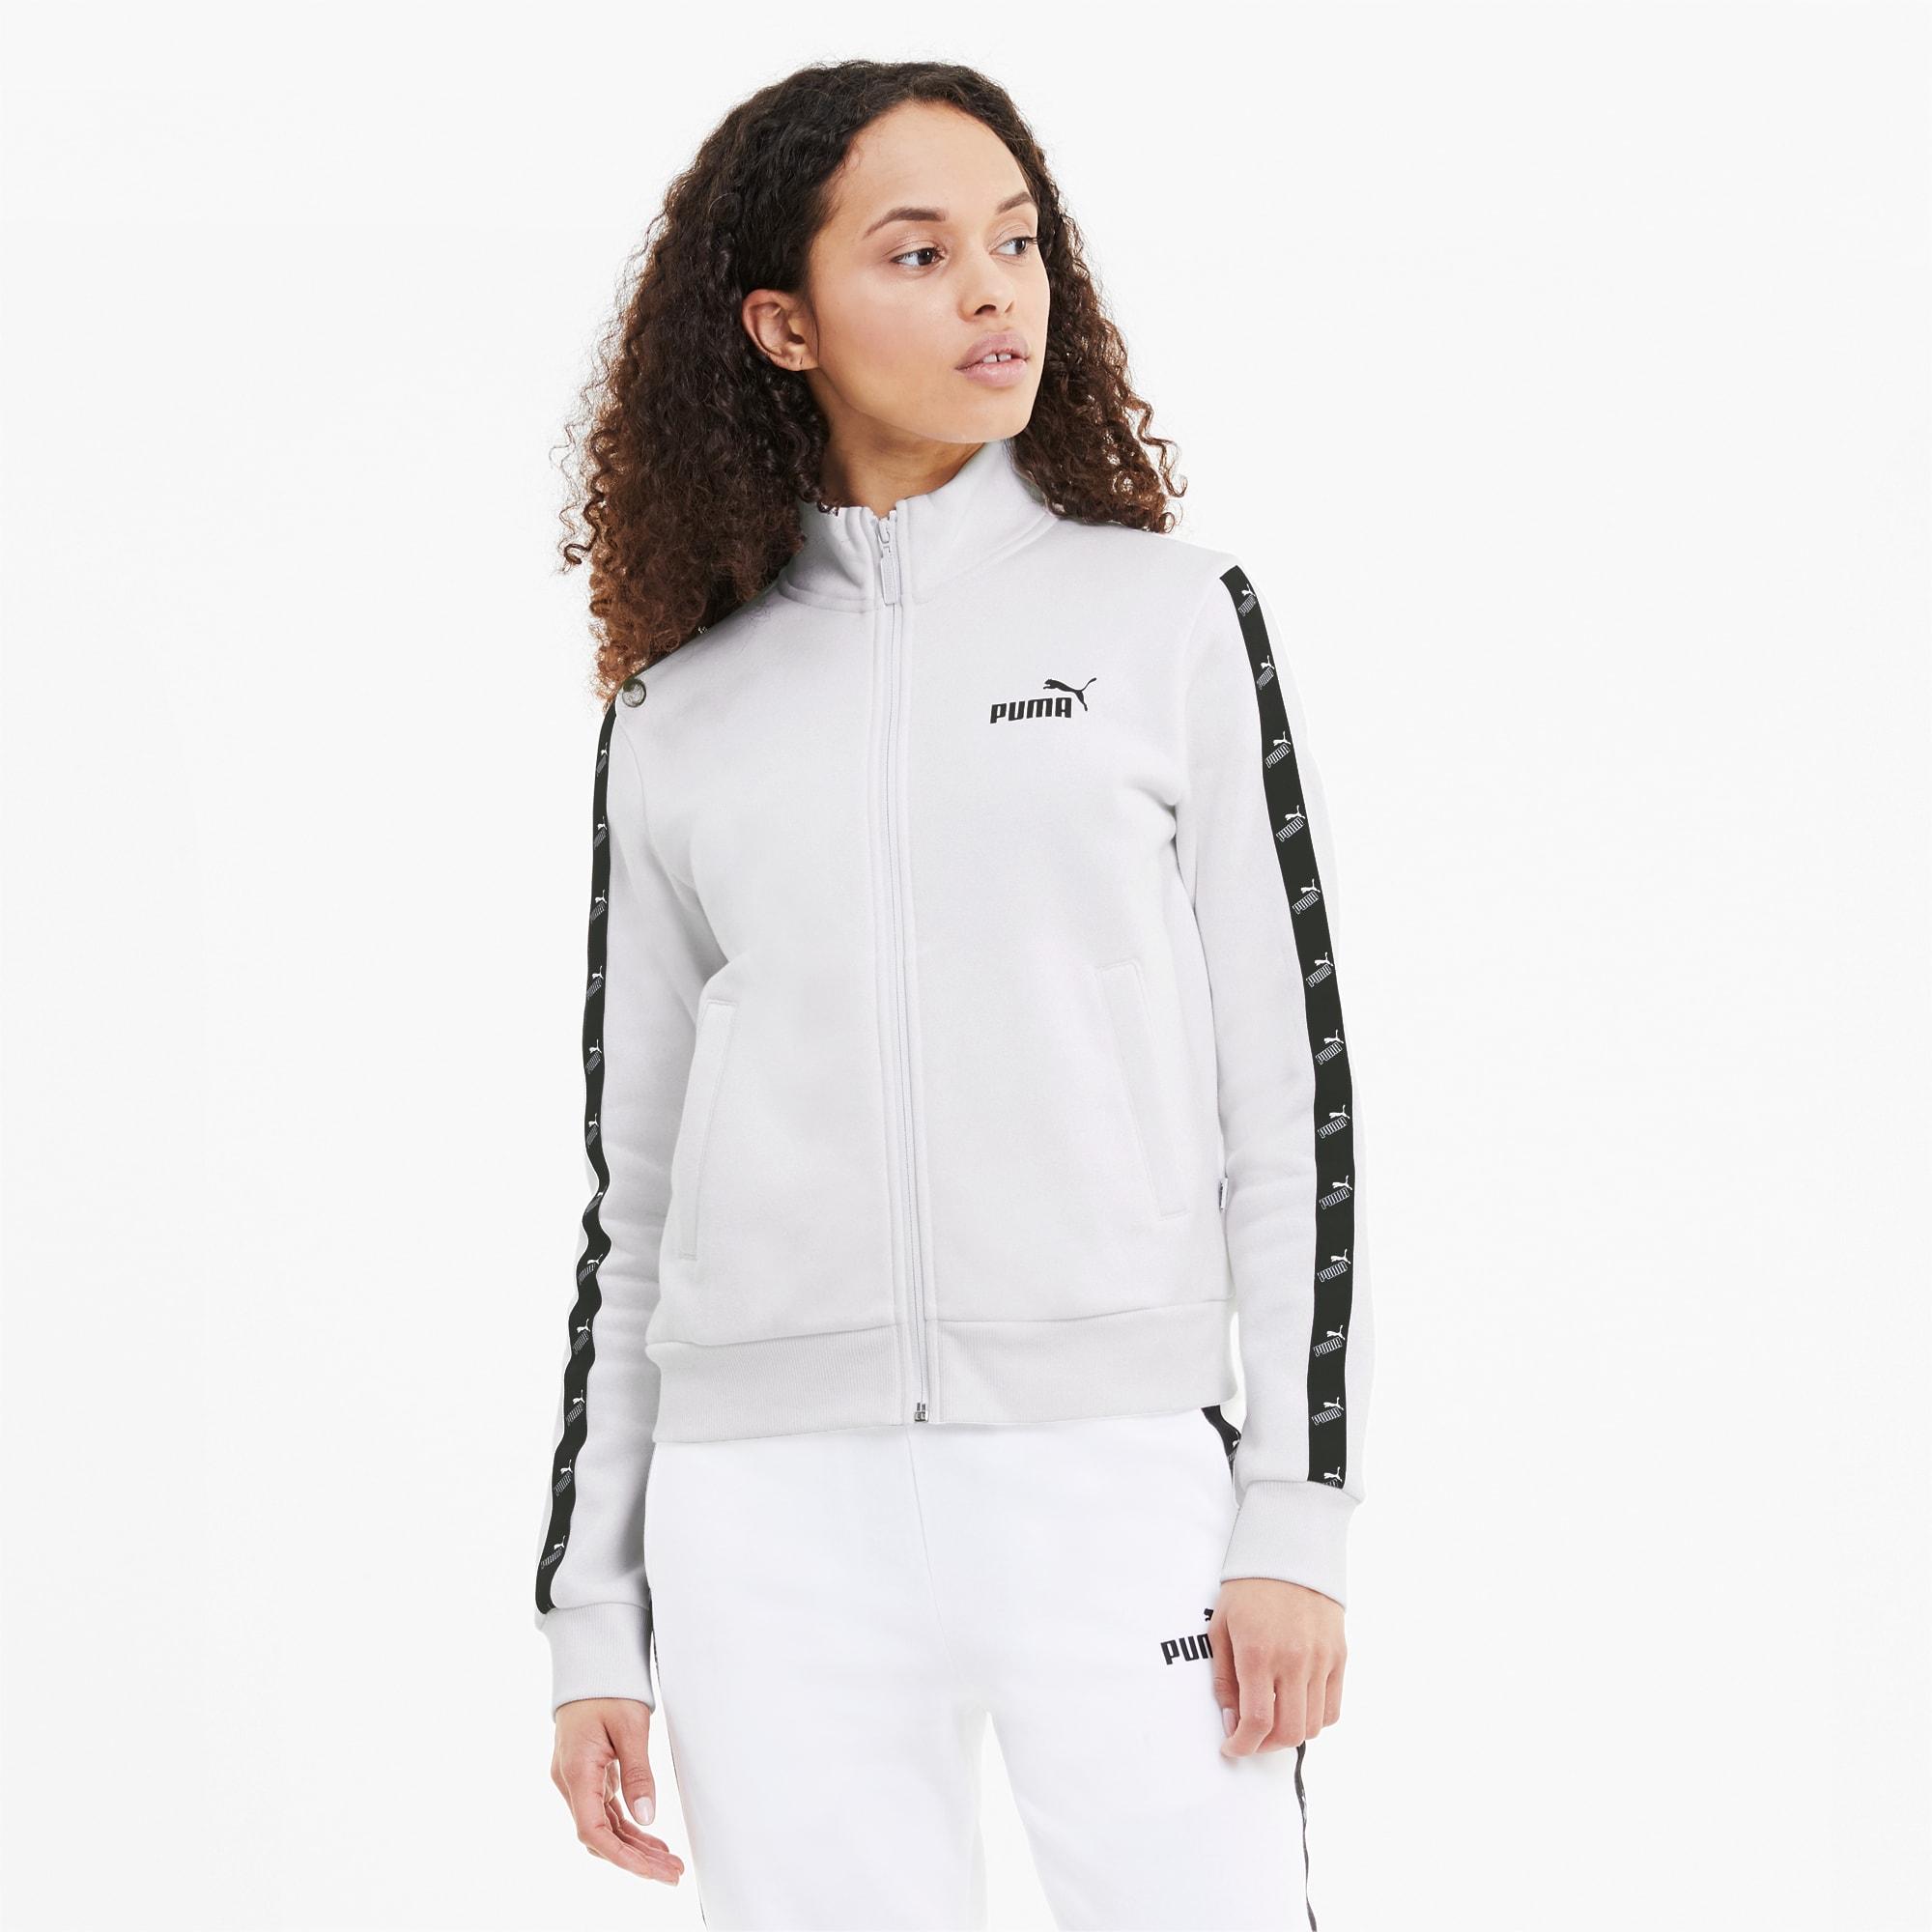 puma -  Amplified Damen Trainingsjacke | Mit Aucun | Weiß | Größe: S